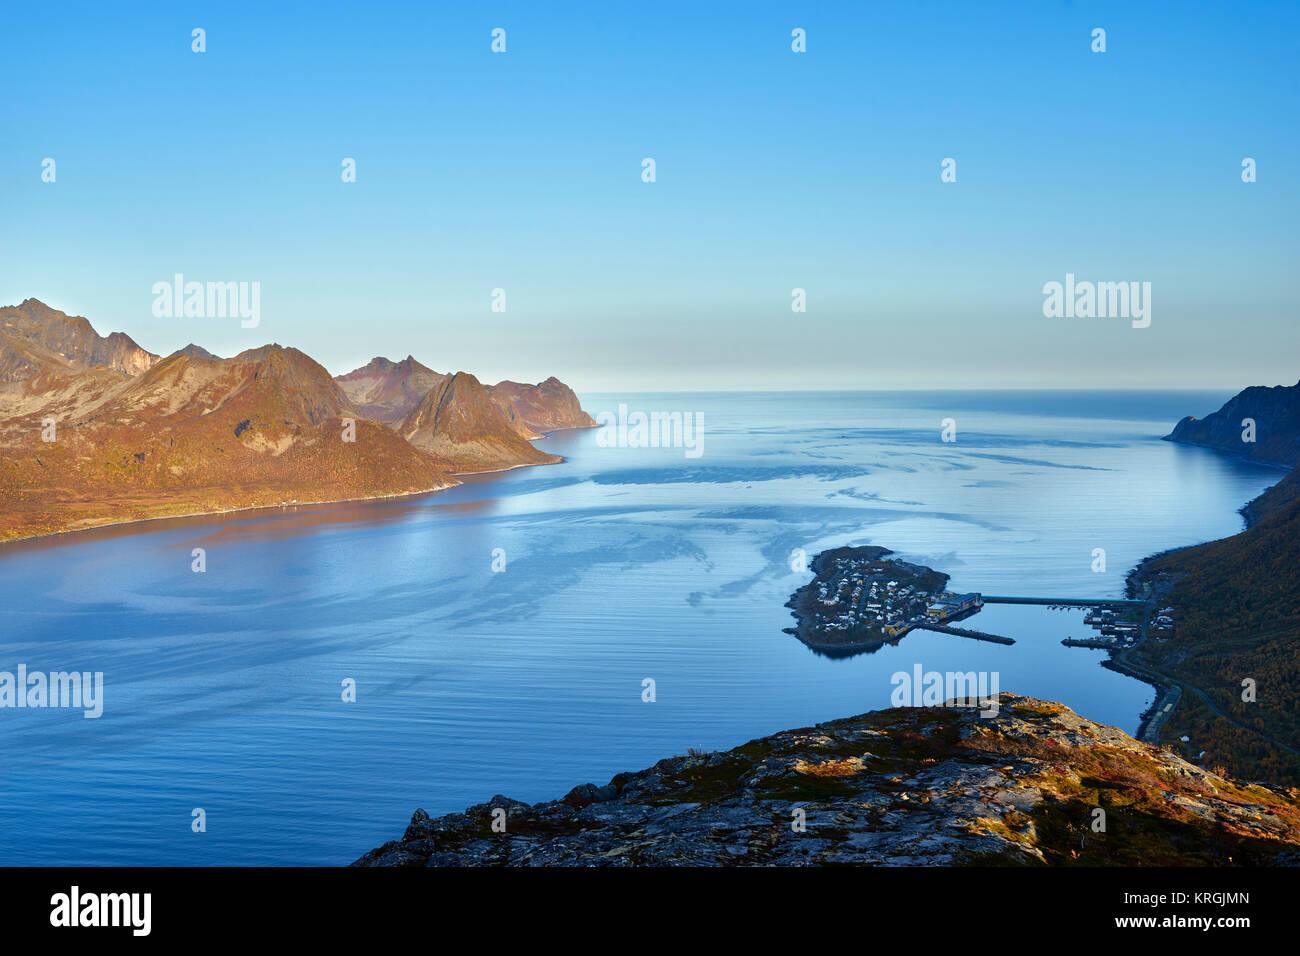 Island fishing village of Husoy in Oyfjorden, Senja, Lenvik, Troms, Norway - Stock Image